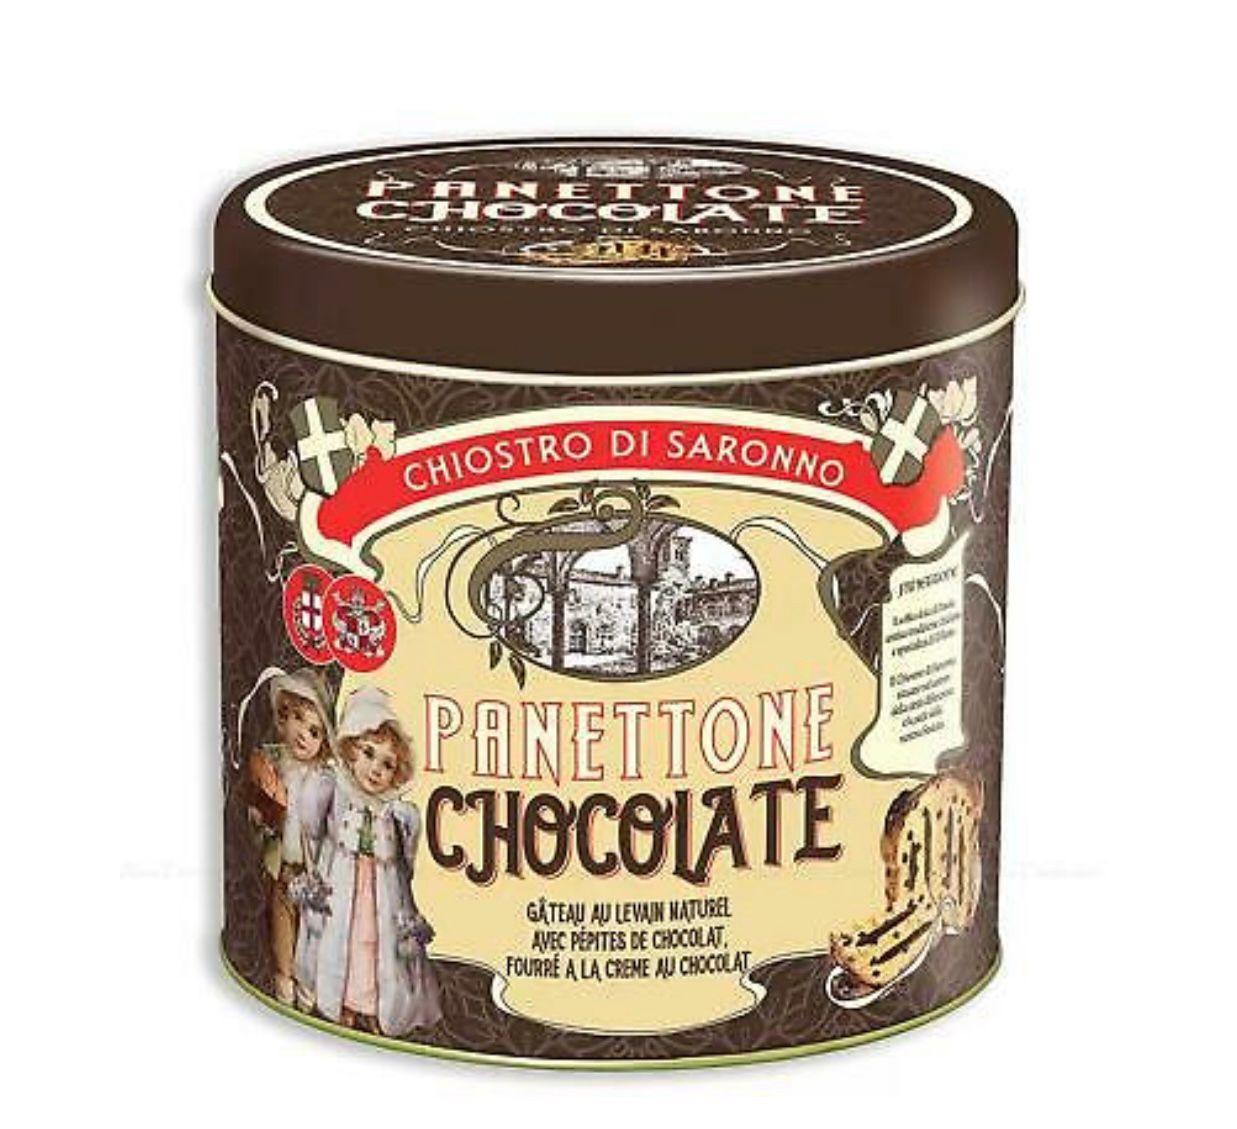 Chocolate panettone traditiona panettone